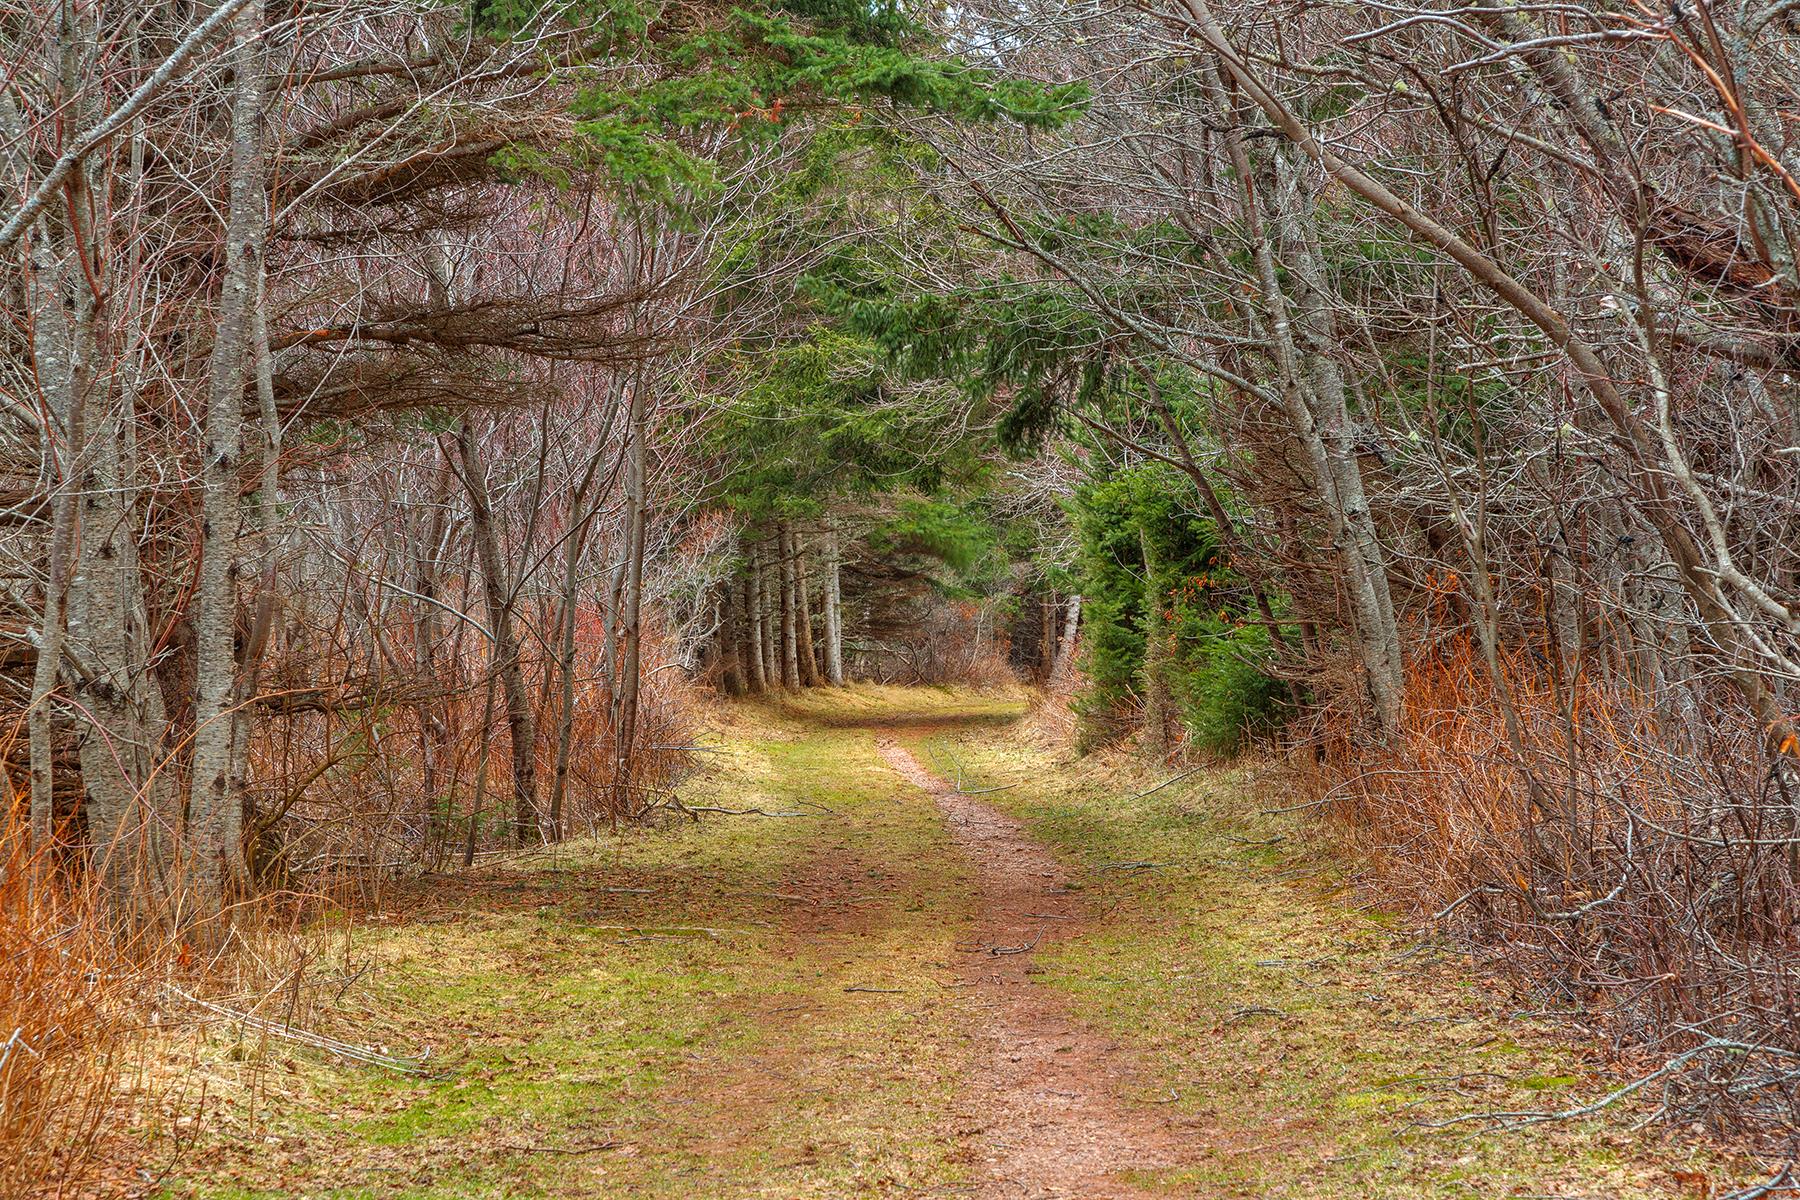 Cavendish Forest Trail - HDR, Passageway, Path, Passage, Pathway, HQ Photo